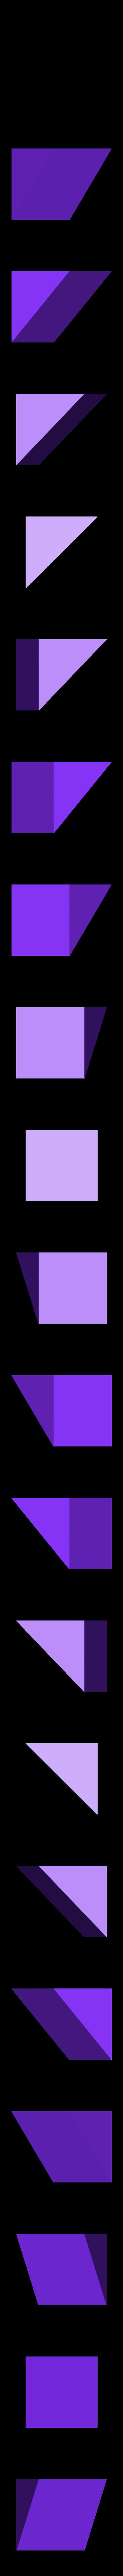 cube_half_qiandu.stl Télécharger fichier STL gratuit Liu Hui Cube Puzzle / Dissection (Qiandu, Yangma, Bie'nao) • Plan imprimable en 3D, LGBU